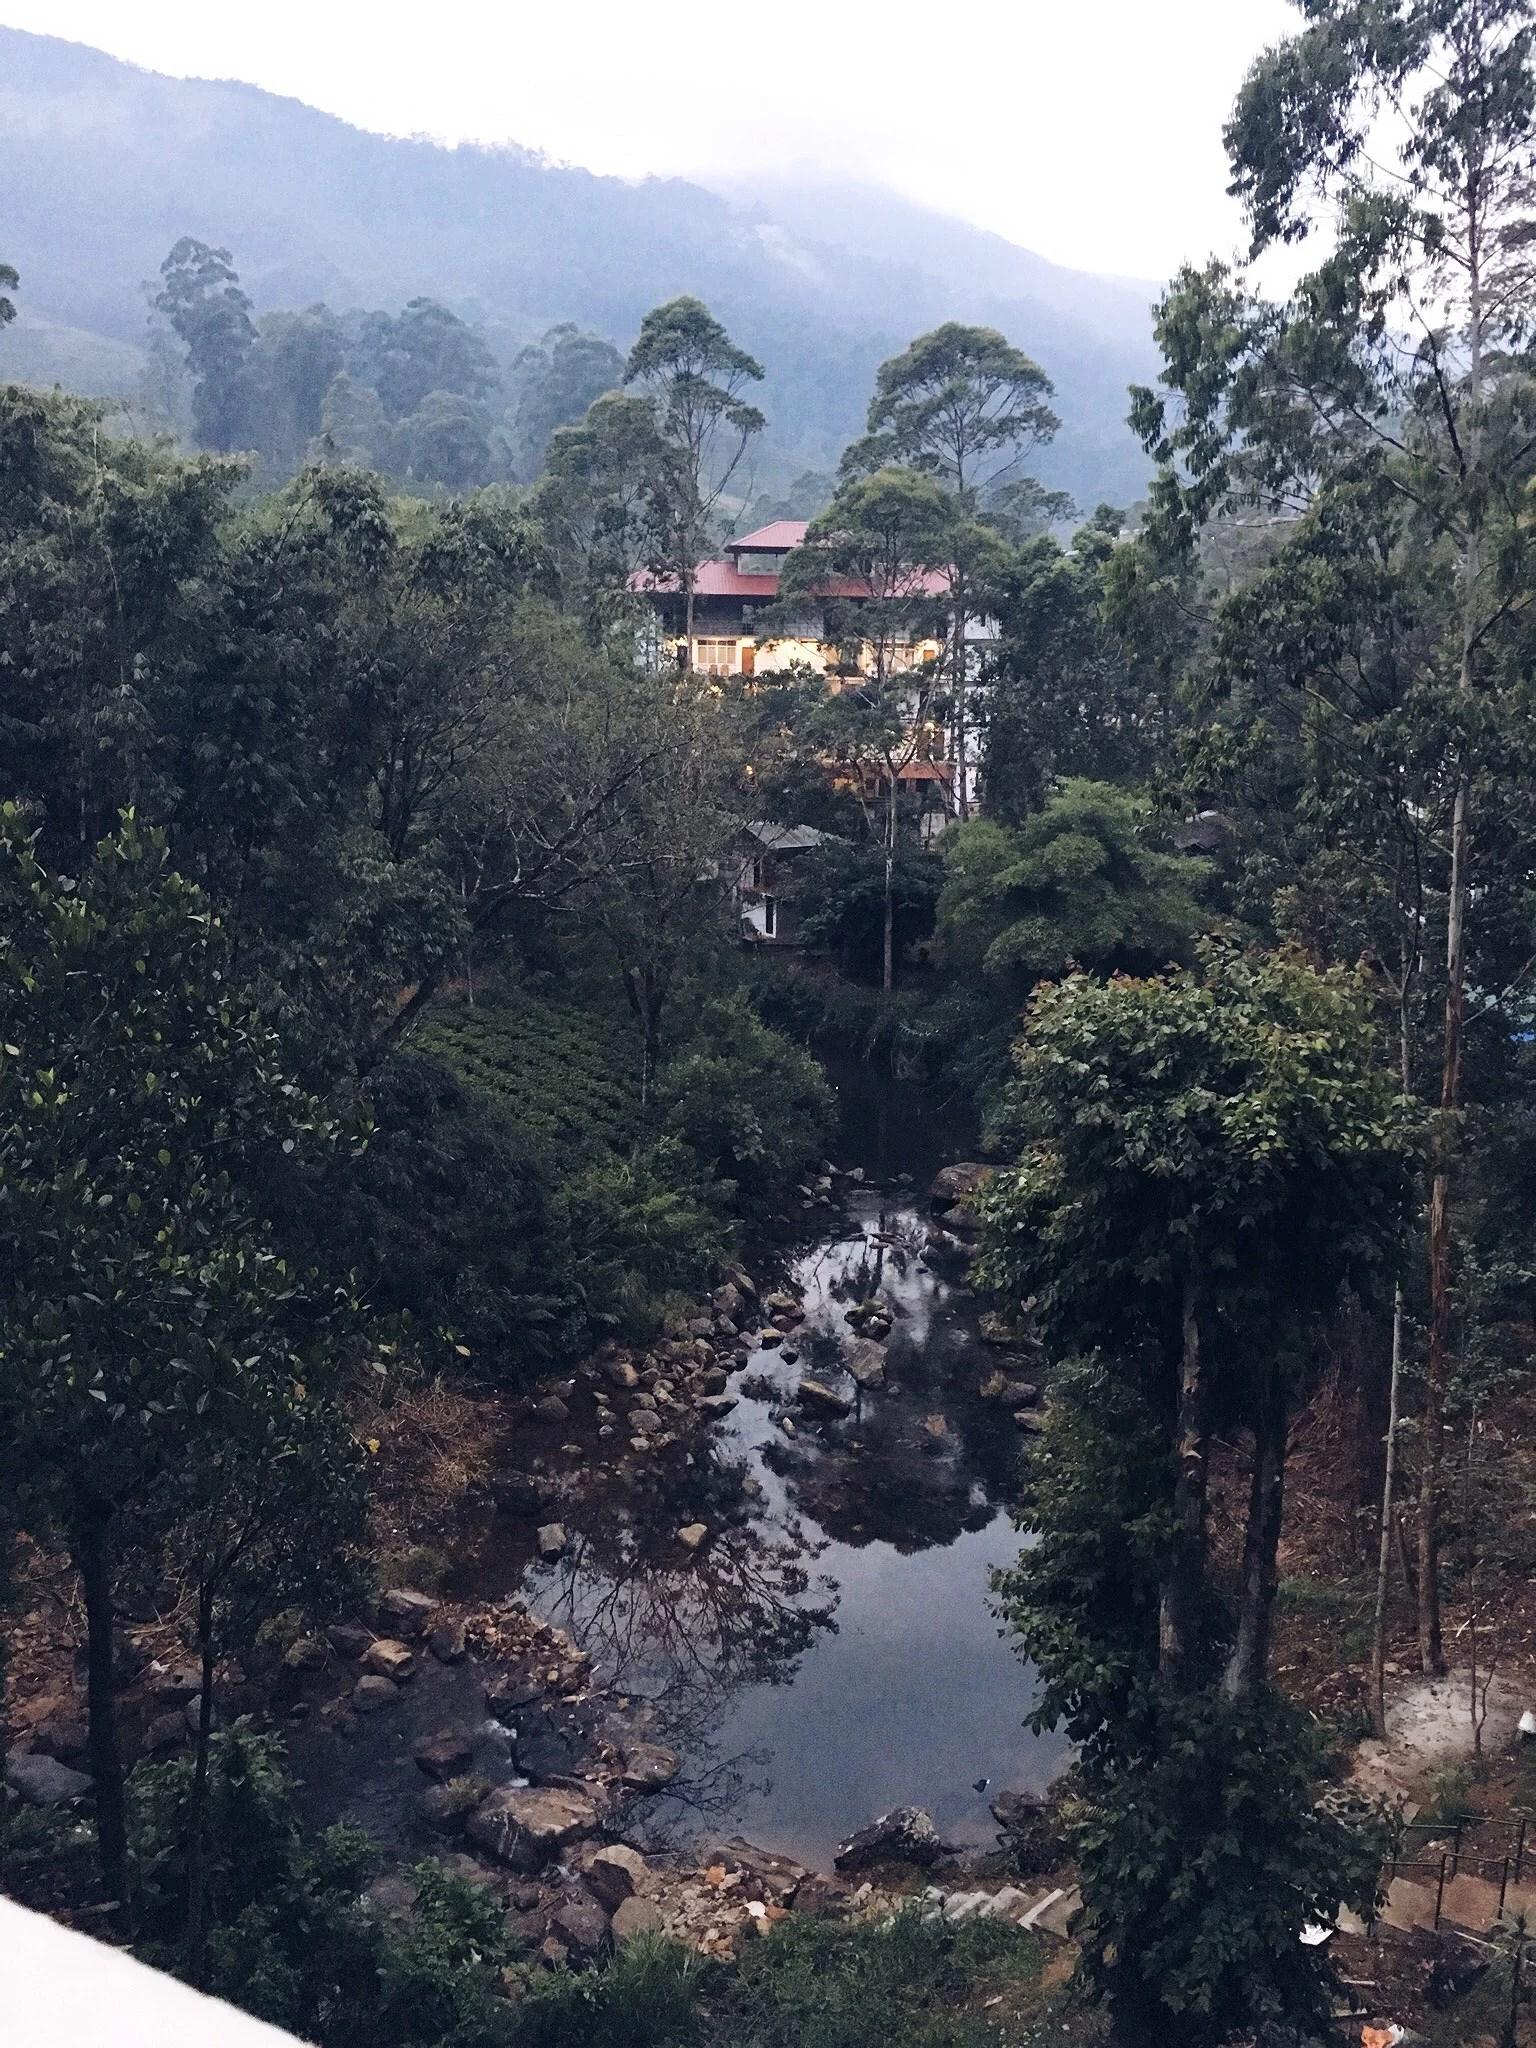 Bye Mirissa - Hello Kandy